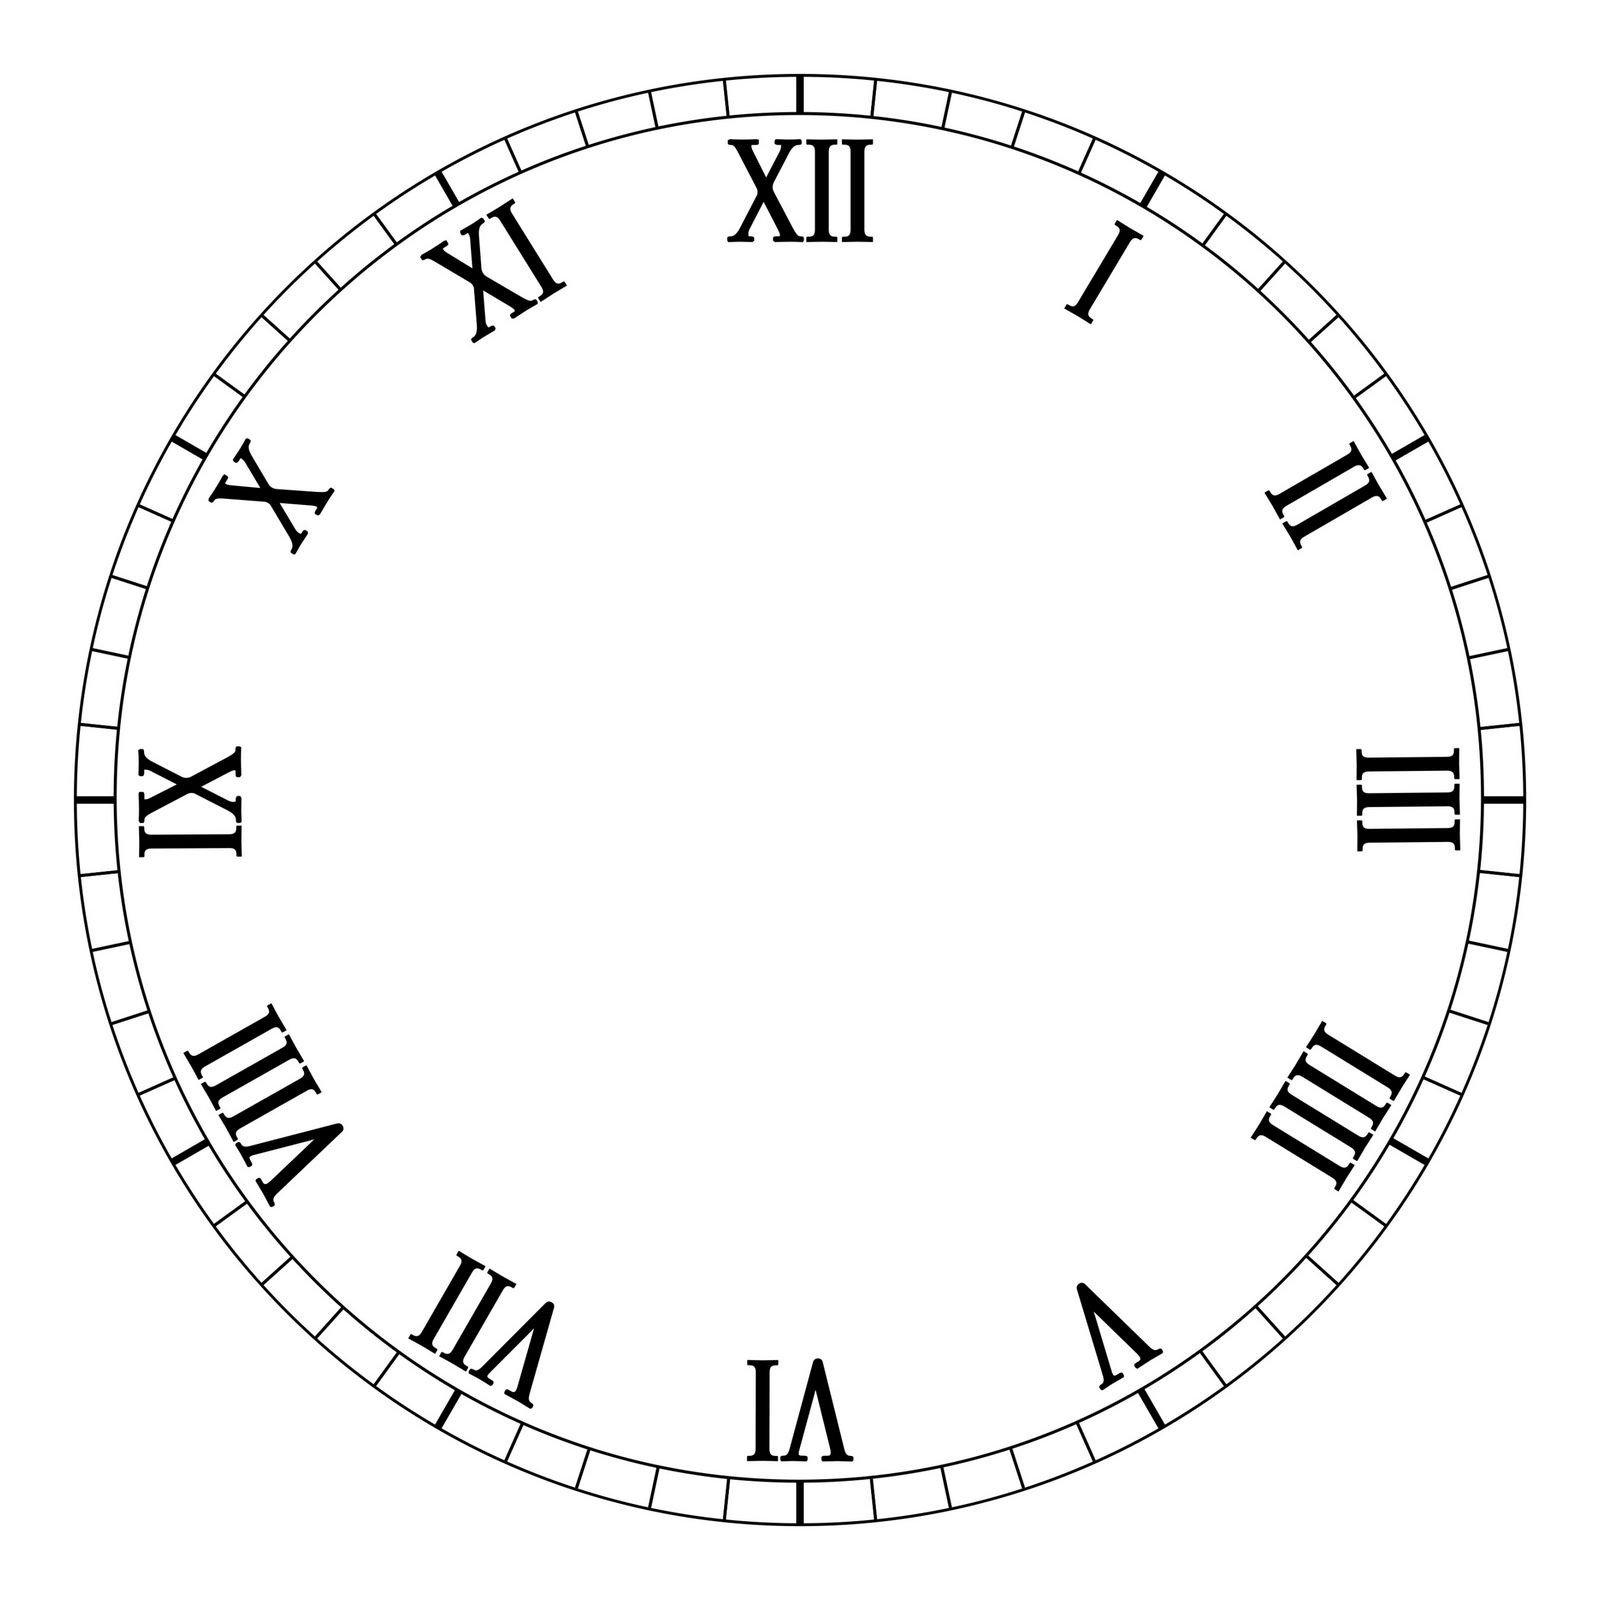 Customizable Clock Face Template Carte Per Decoupage Free Quadranti Per orologi Manifantasia